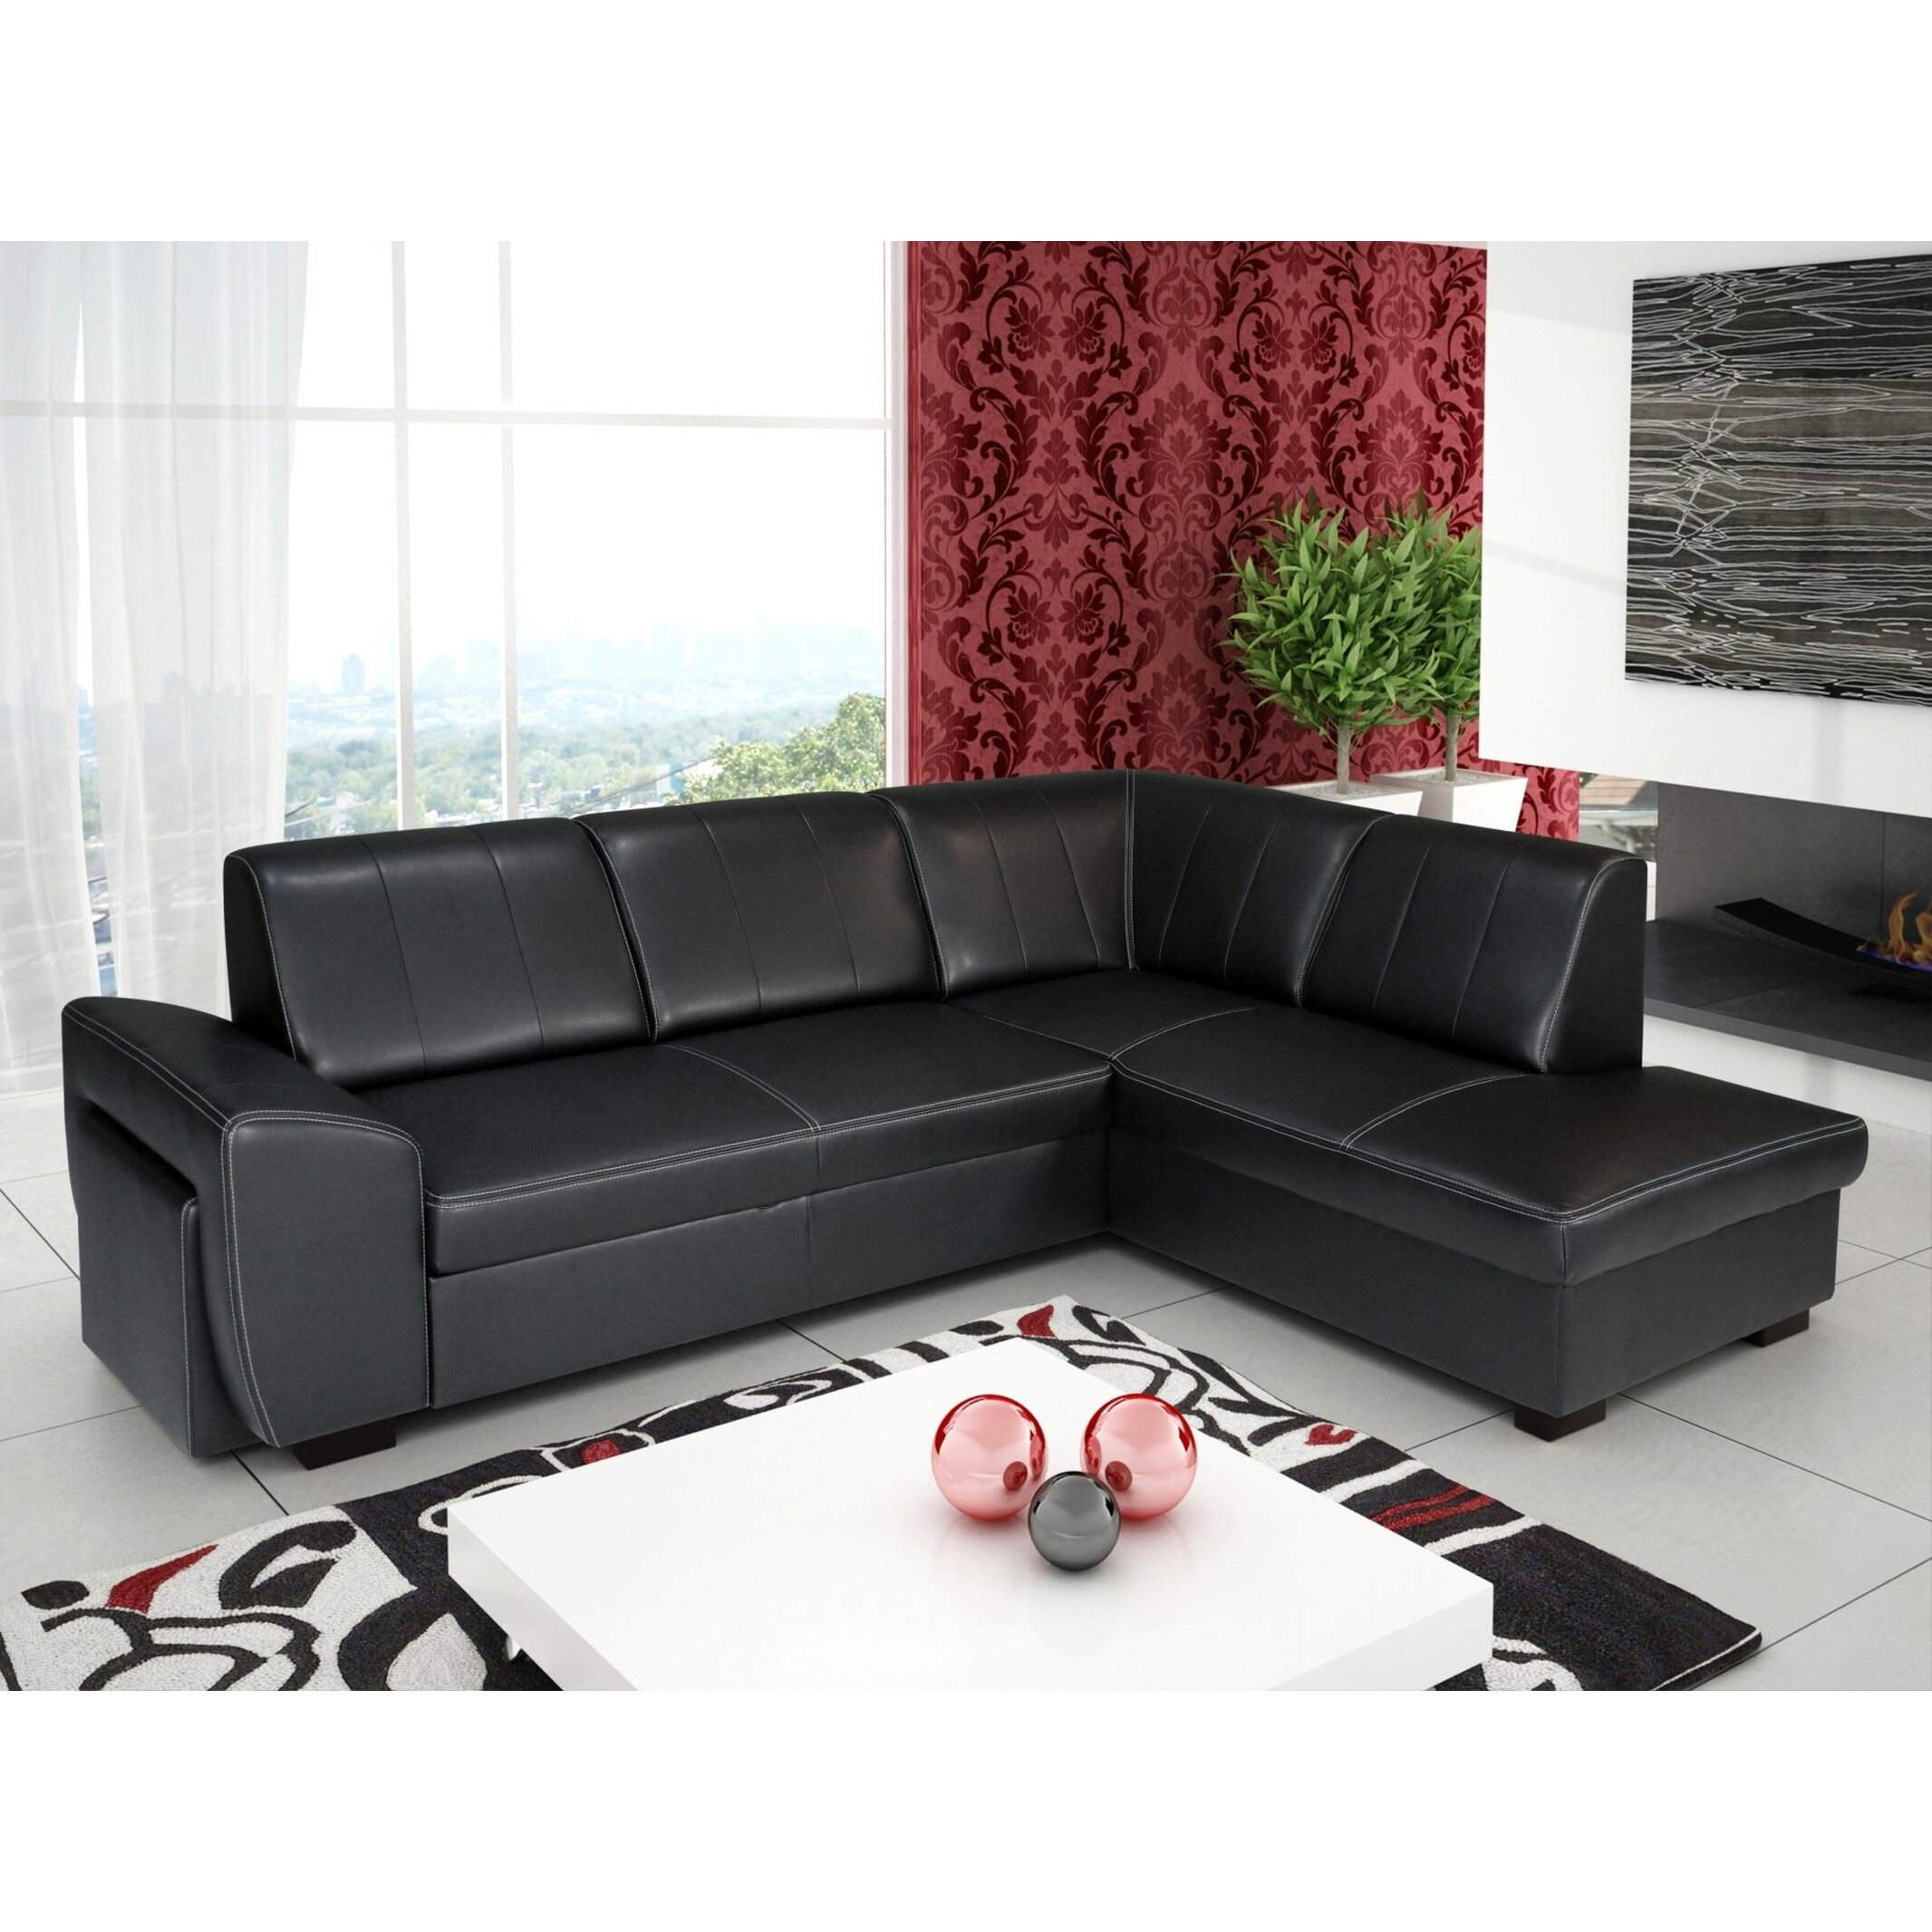 home haus orchideus corner sofa bed wayfair uk. Black Bedroom Furniture Sets. Home Design Ideas